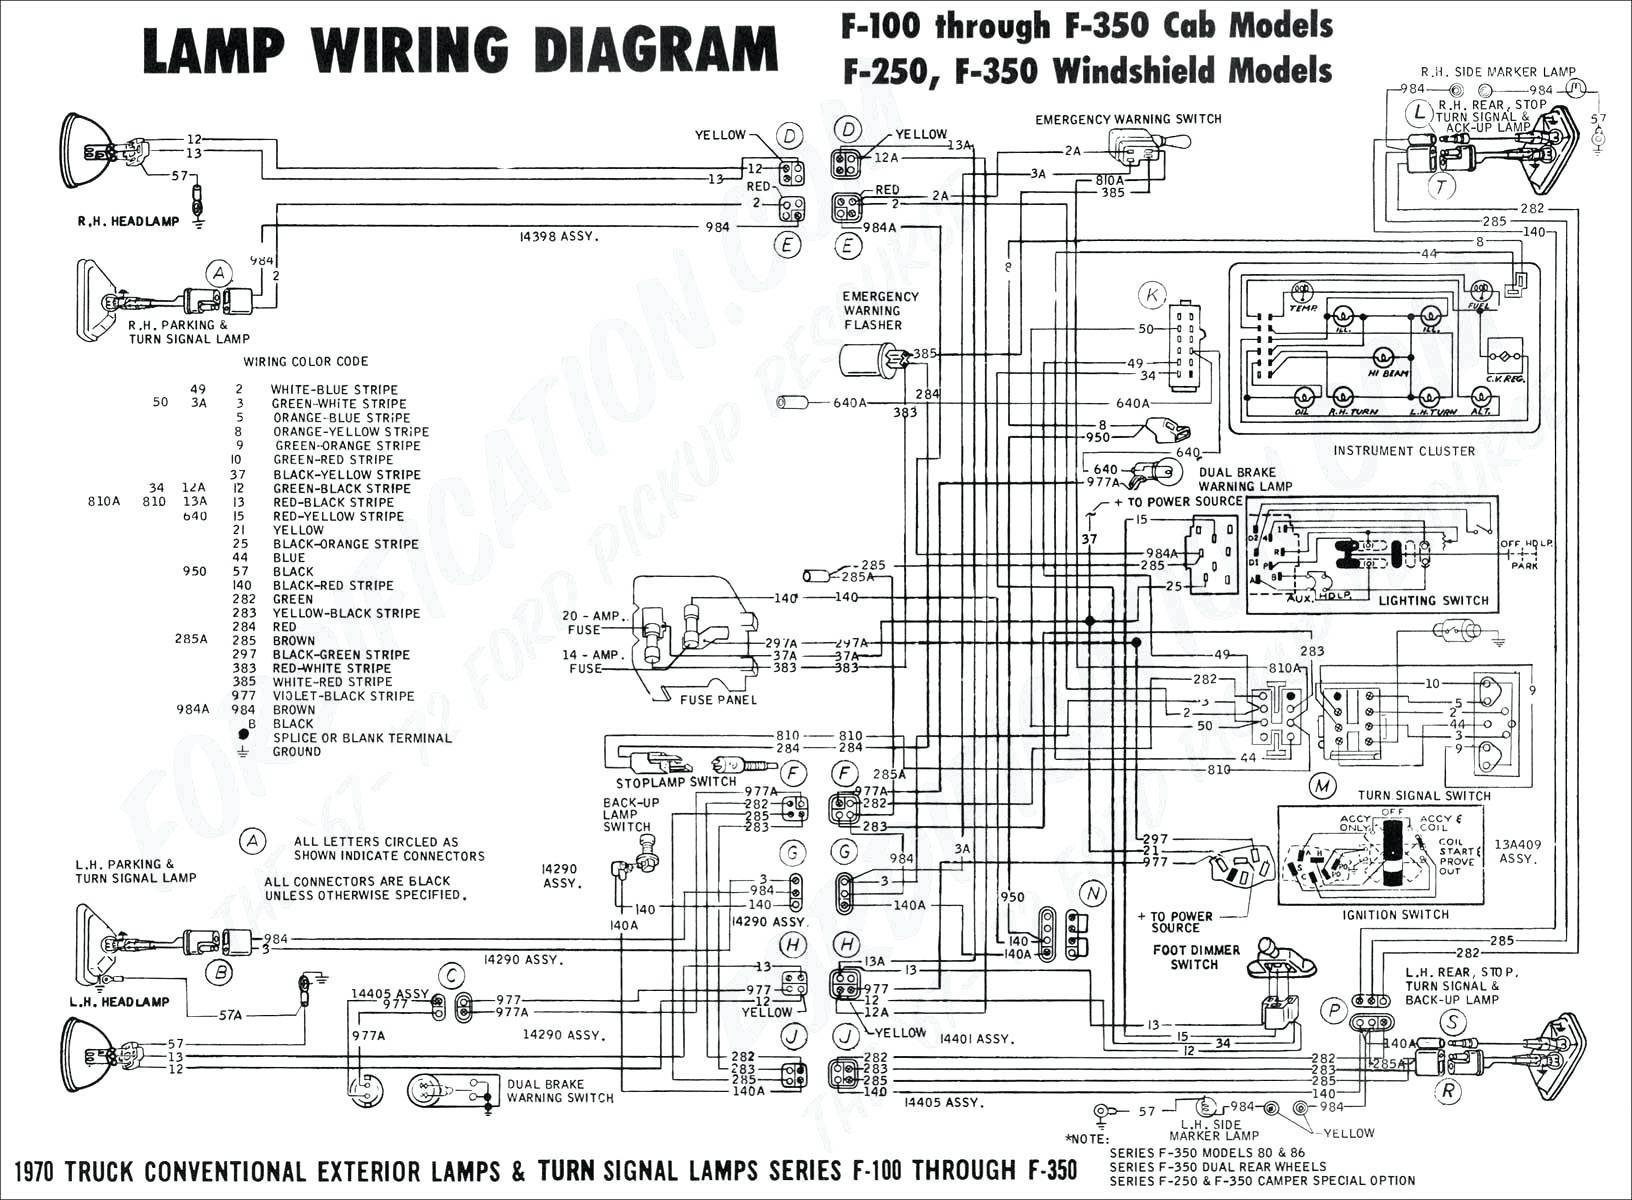 1979 ford f100 engine diagram wiring diagram used 1979 ford f 150 vacuum diagram wiring diagram